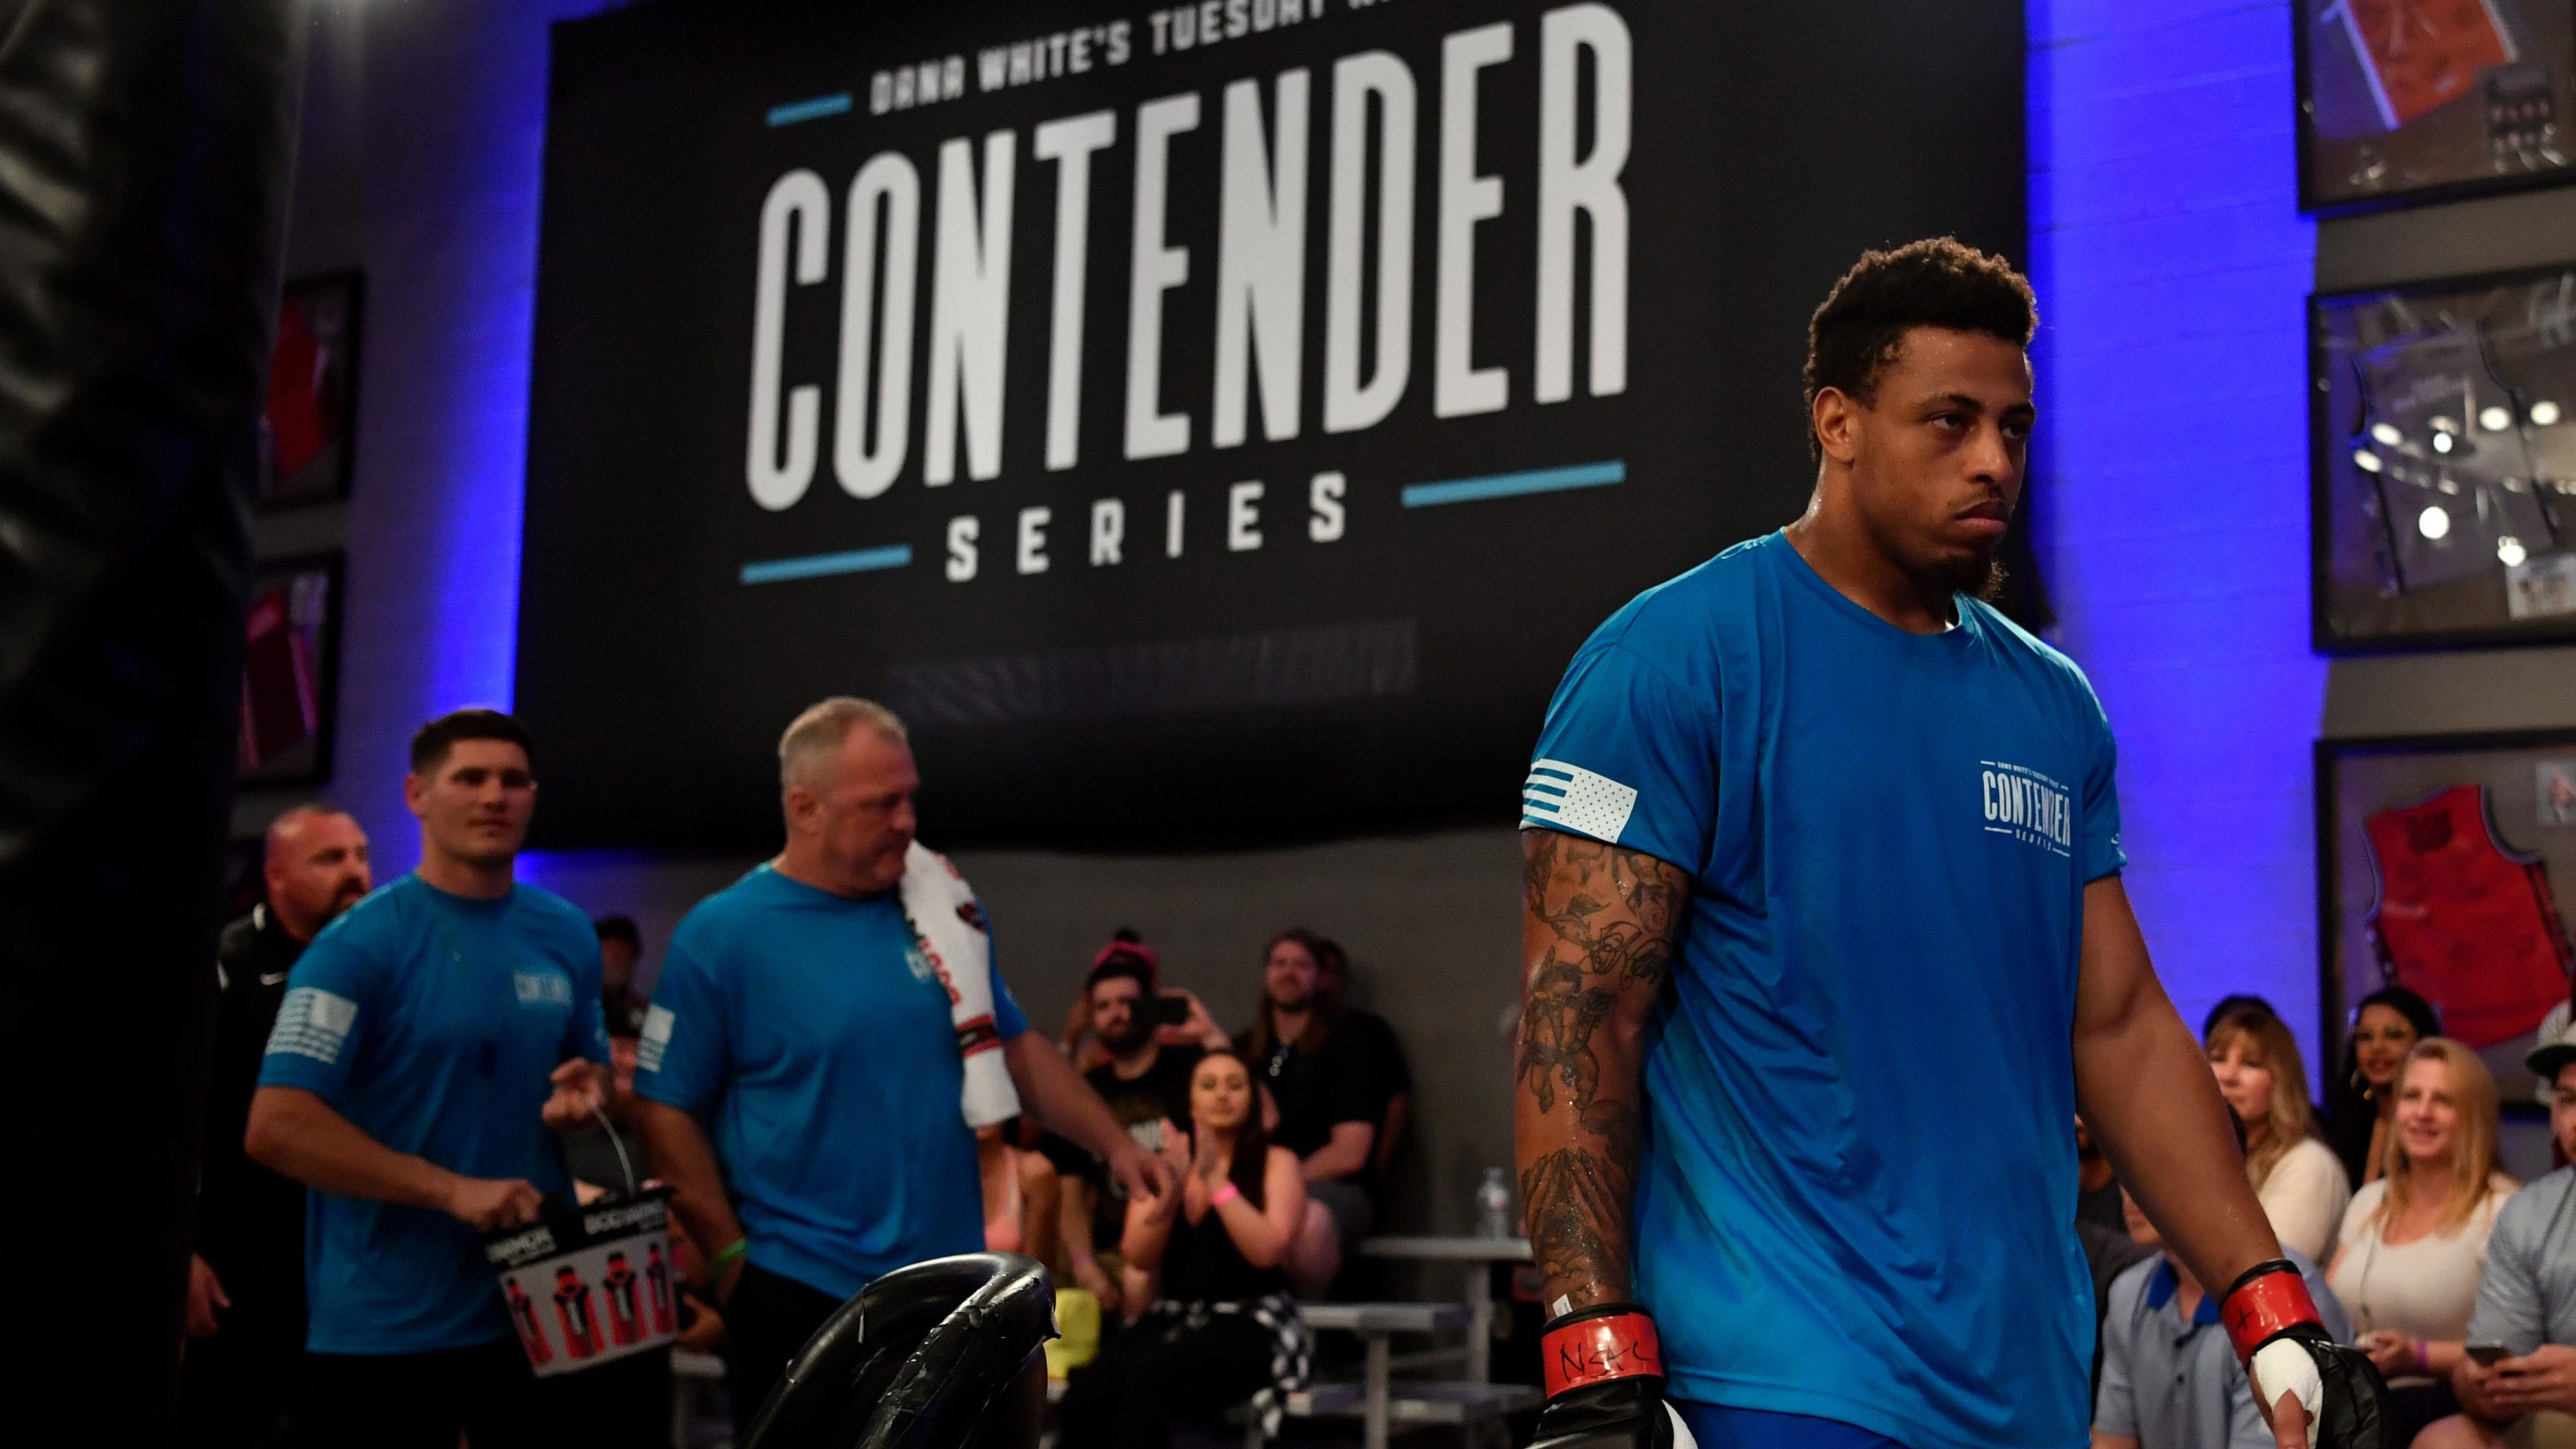 Dana White's Tuesday Night Contender Series: Hardy v Lane